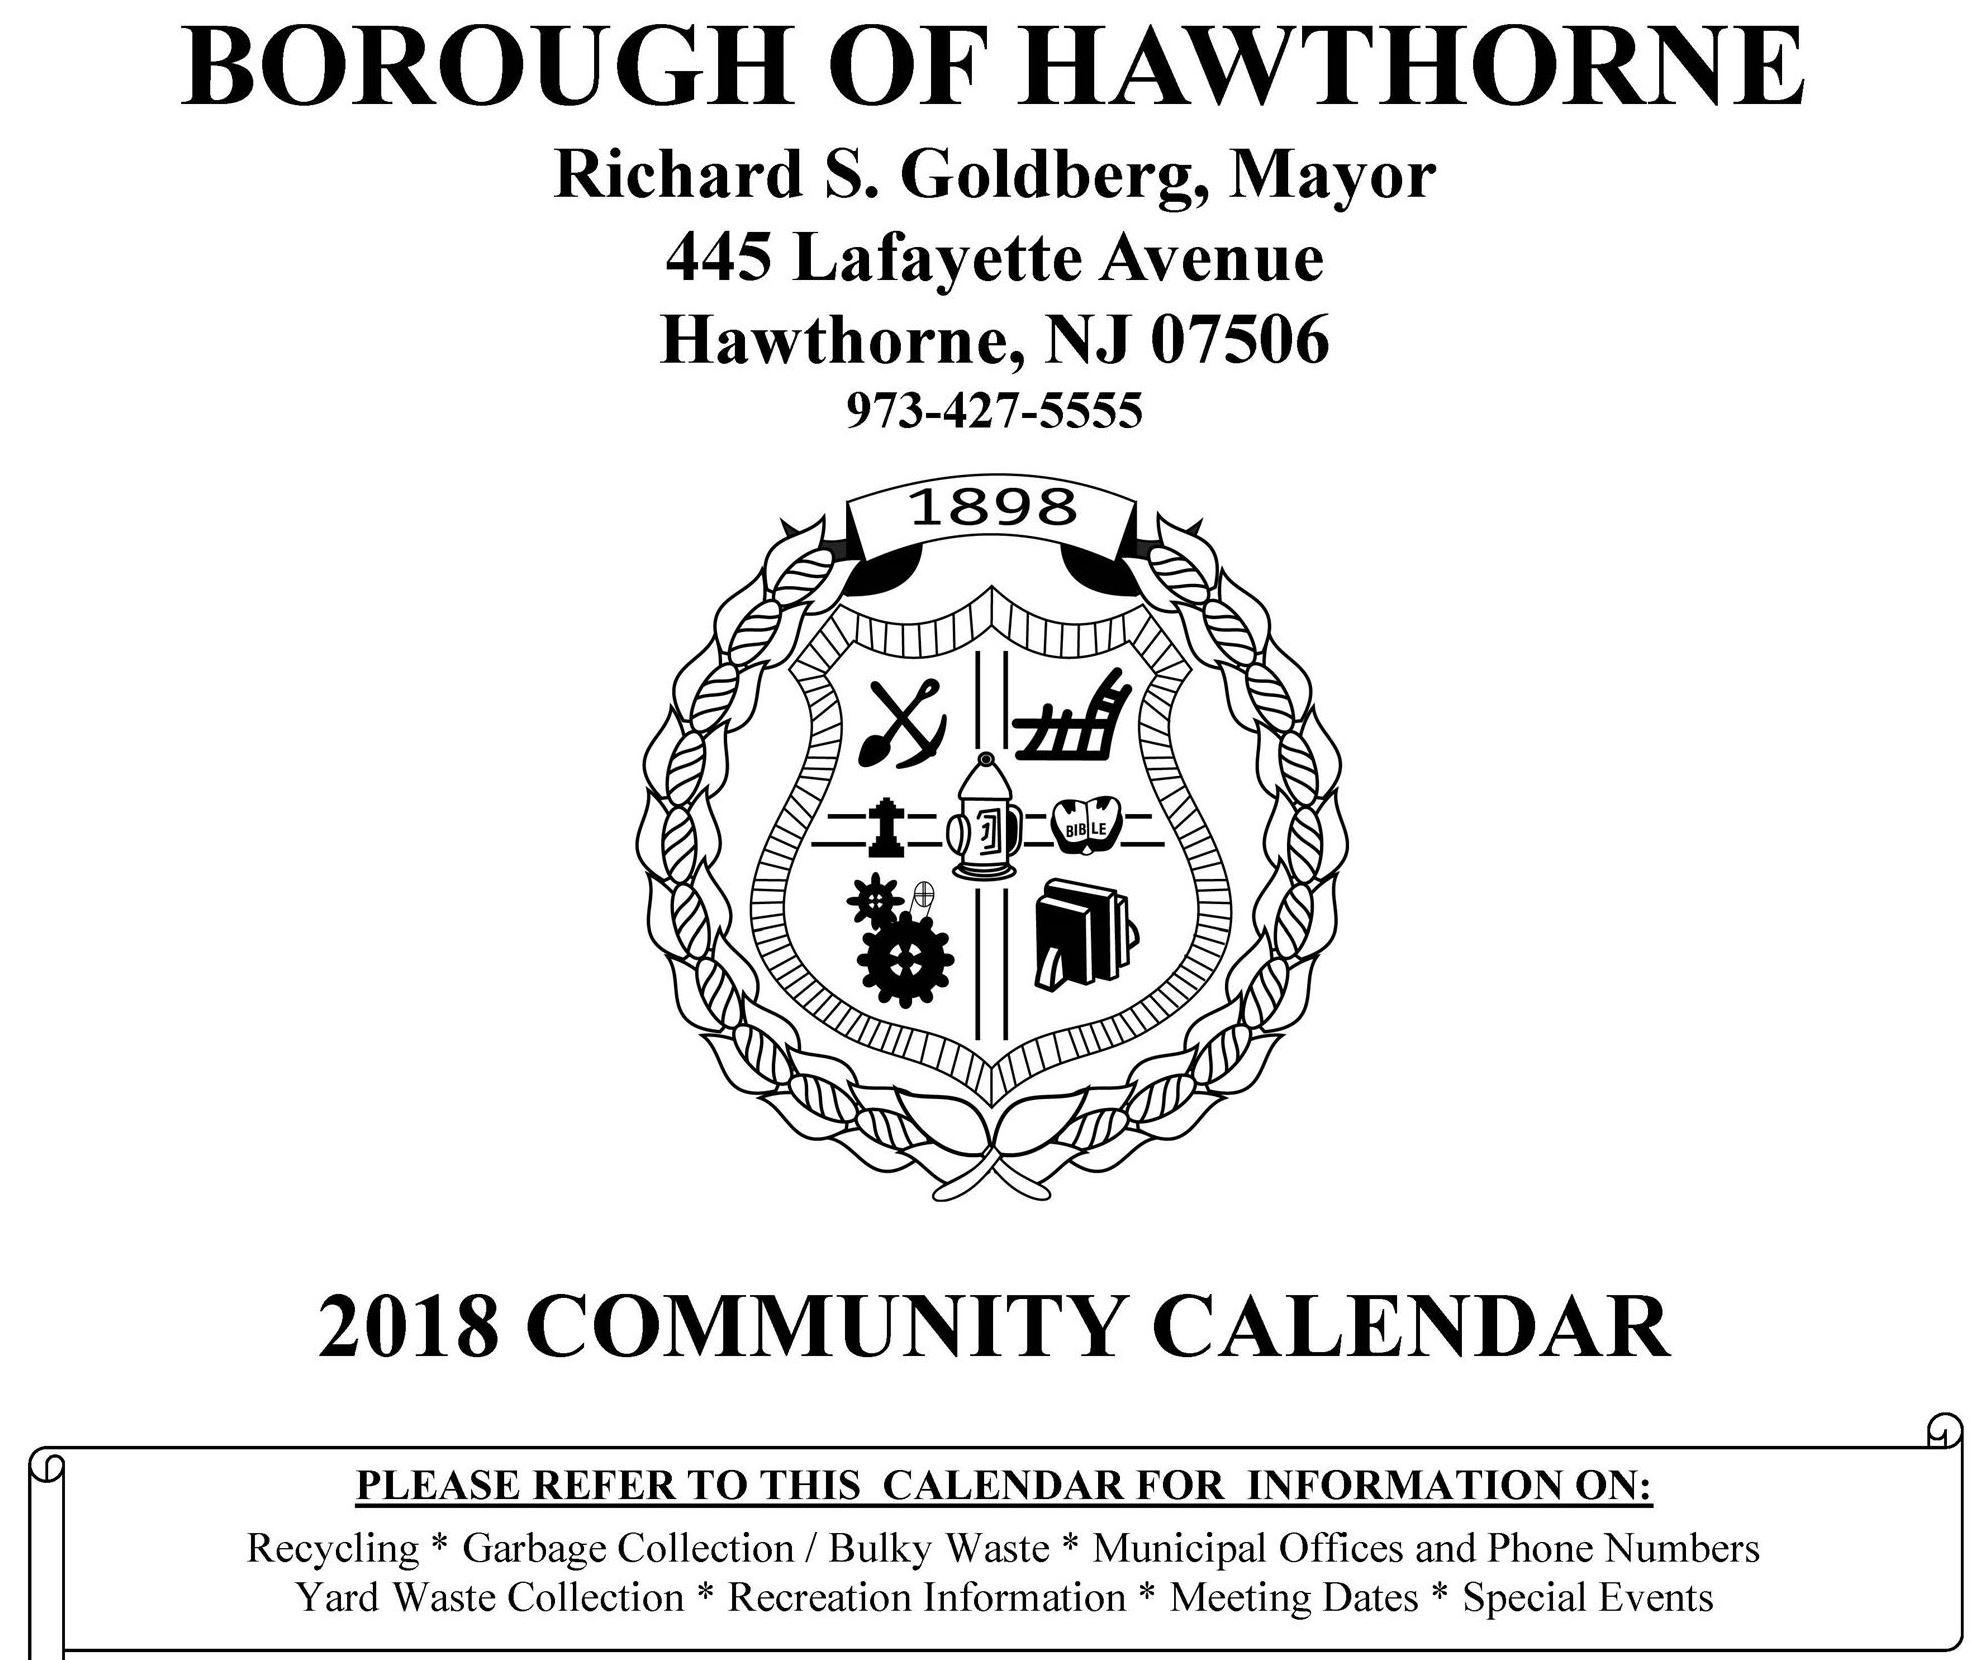 BOROUGH OF HAWTHORNE 04a8de321c89